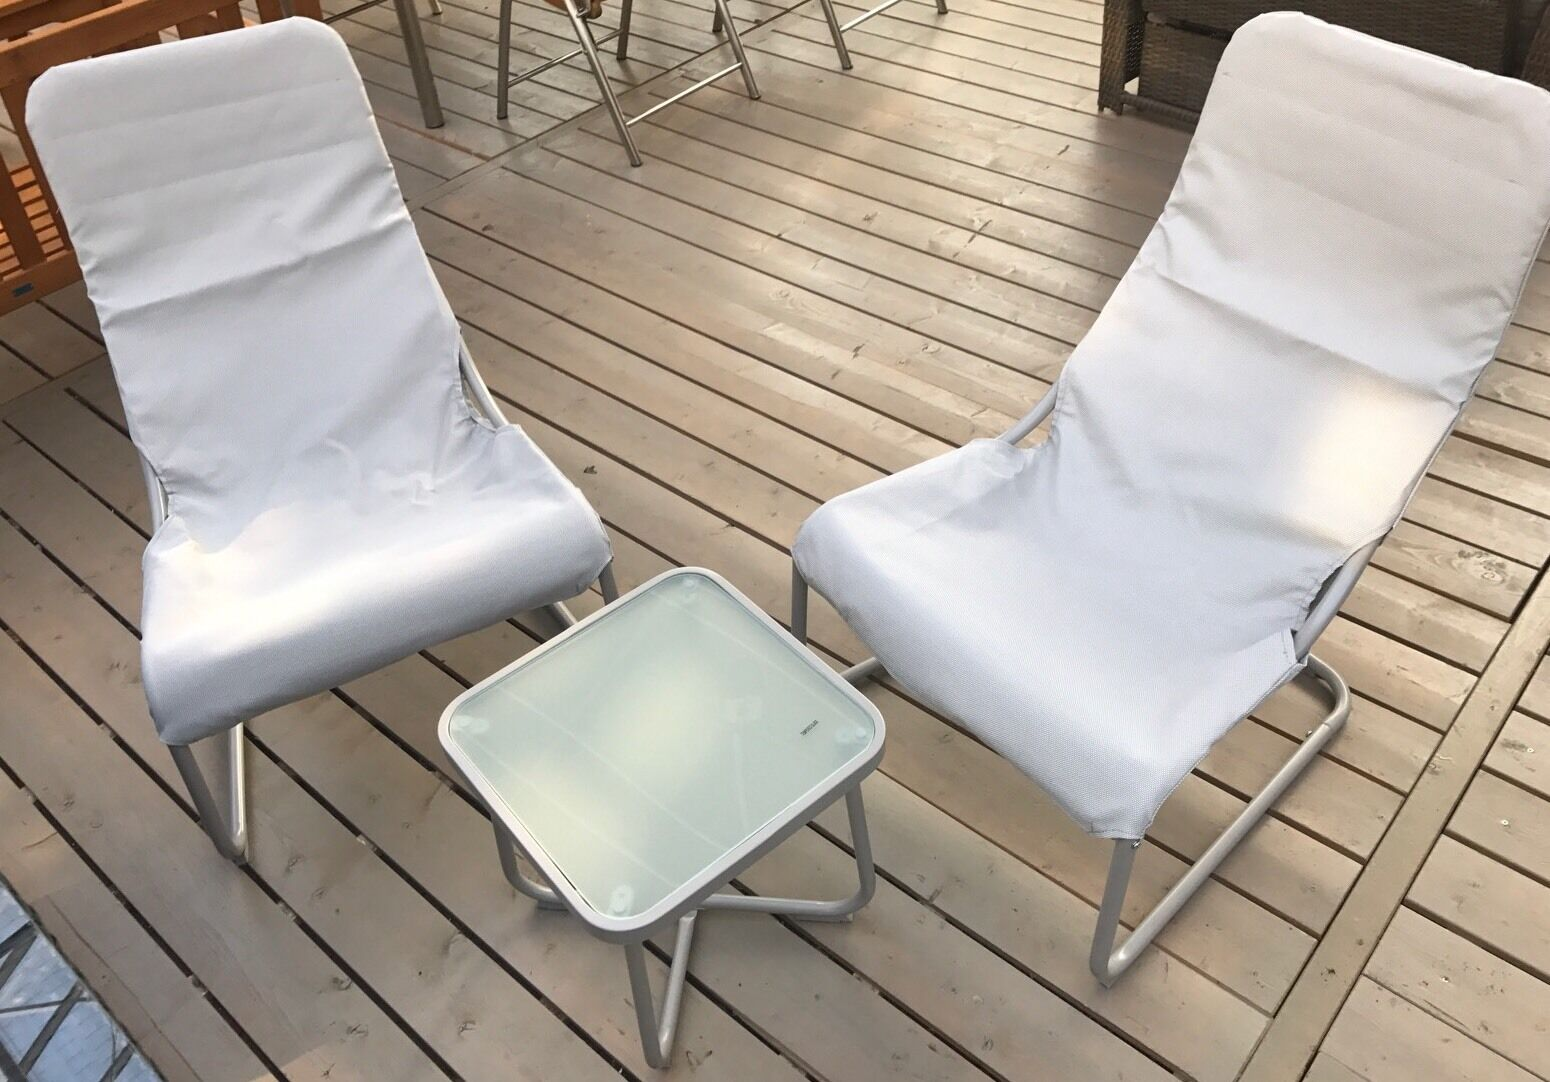 Balkonmöbel Set Melfi Campingset 3 teilig inkl Tisch Terrasse NEU & OVP